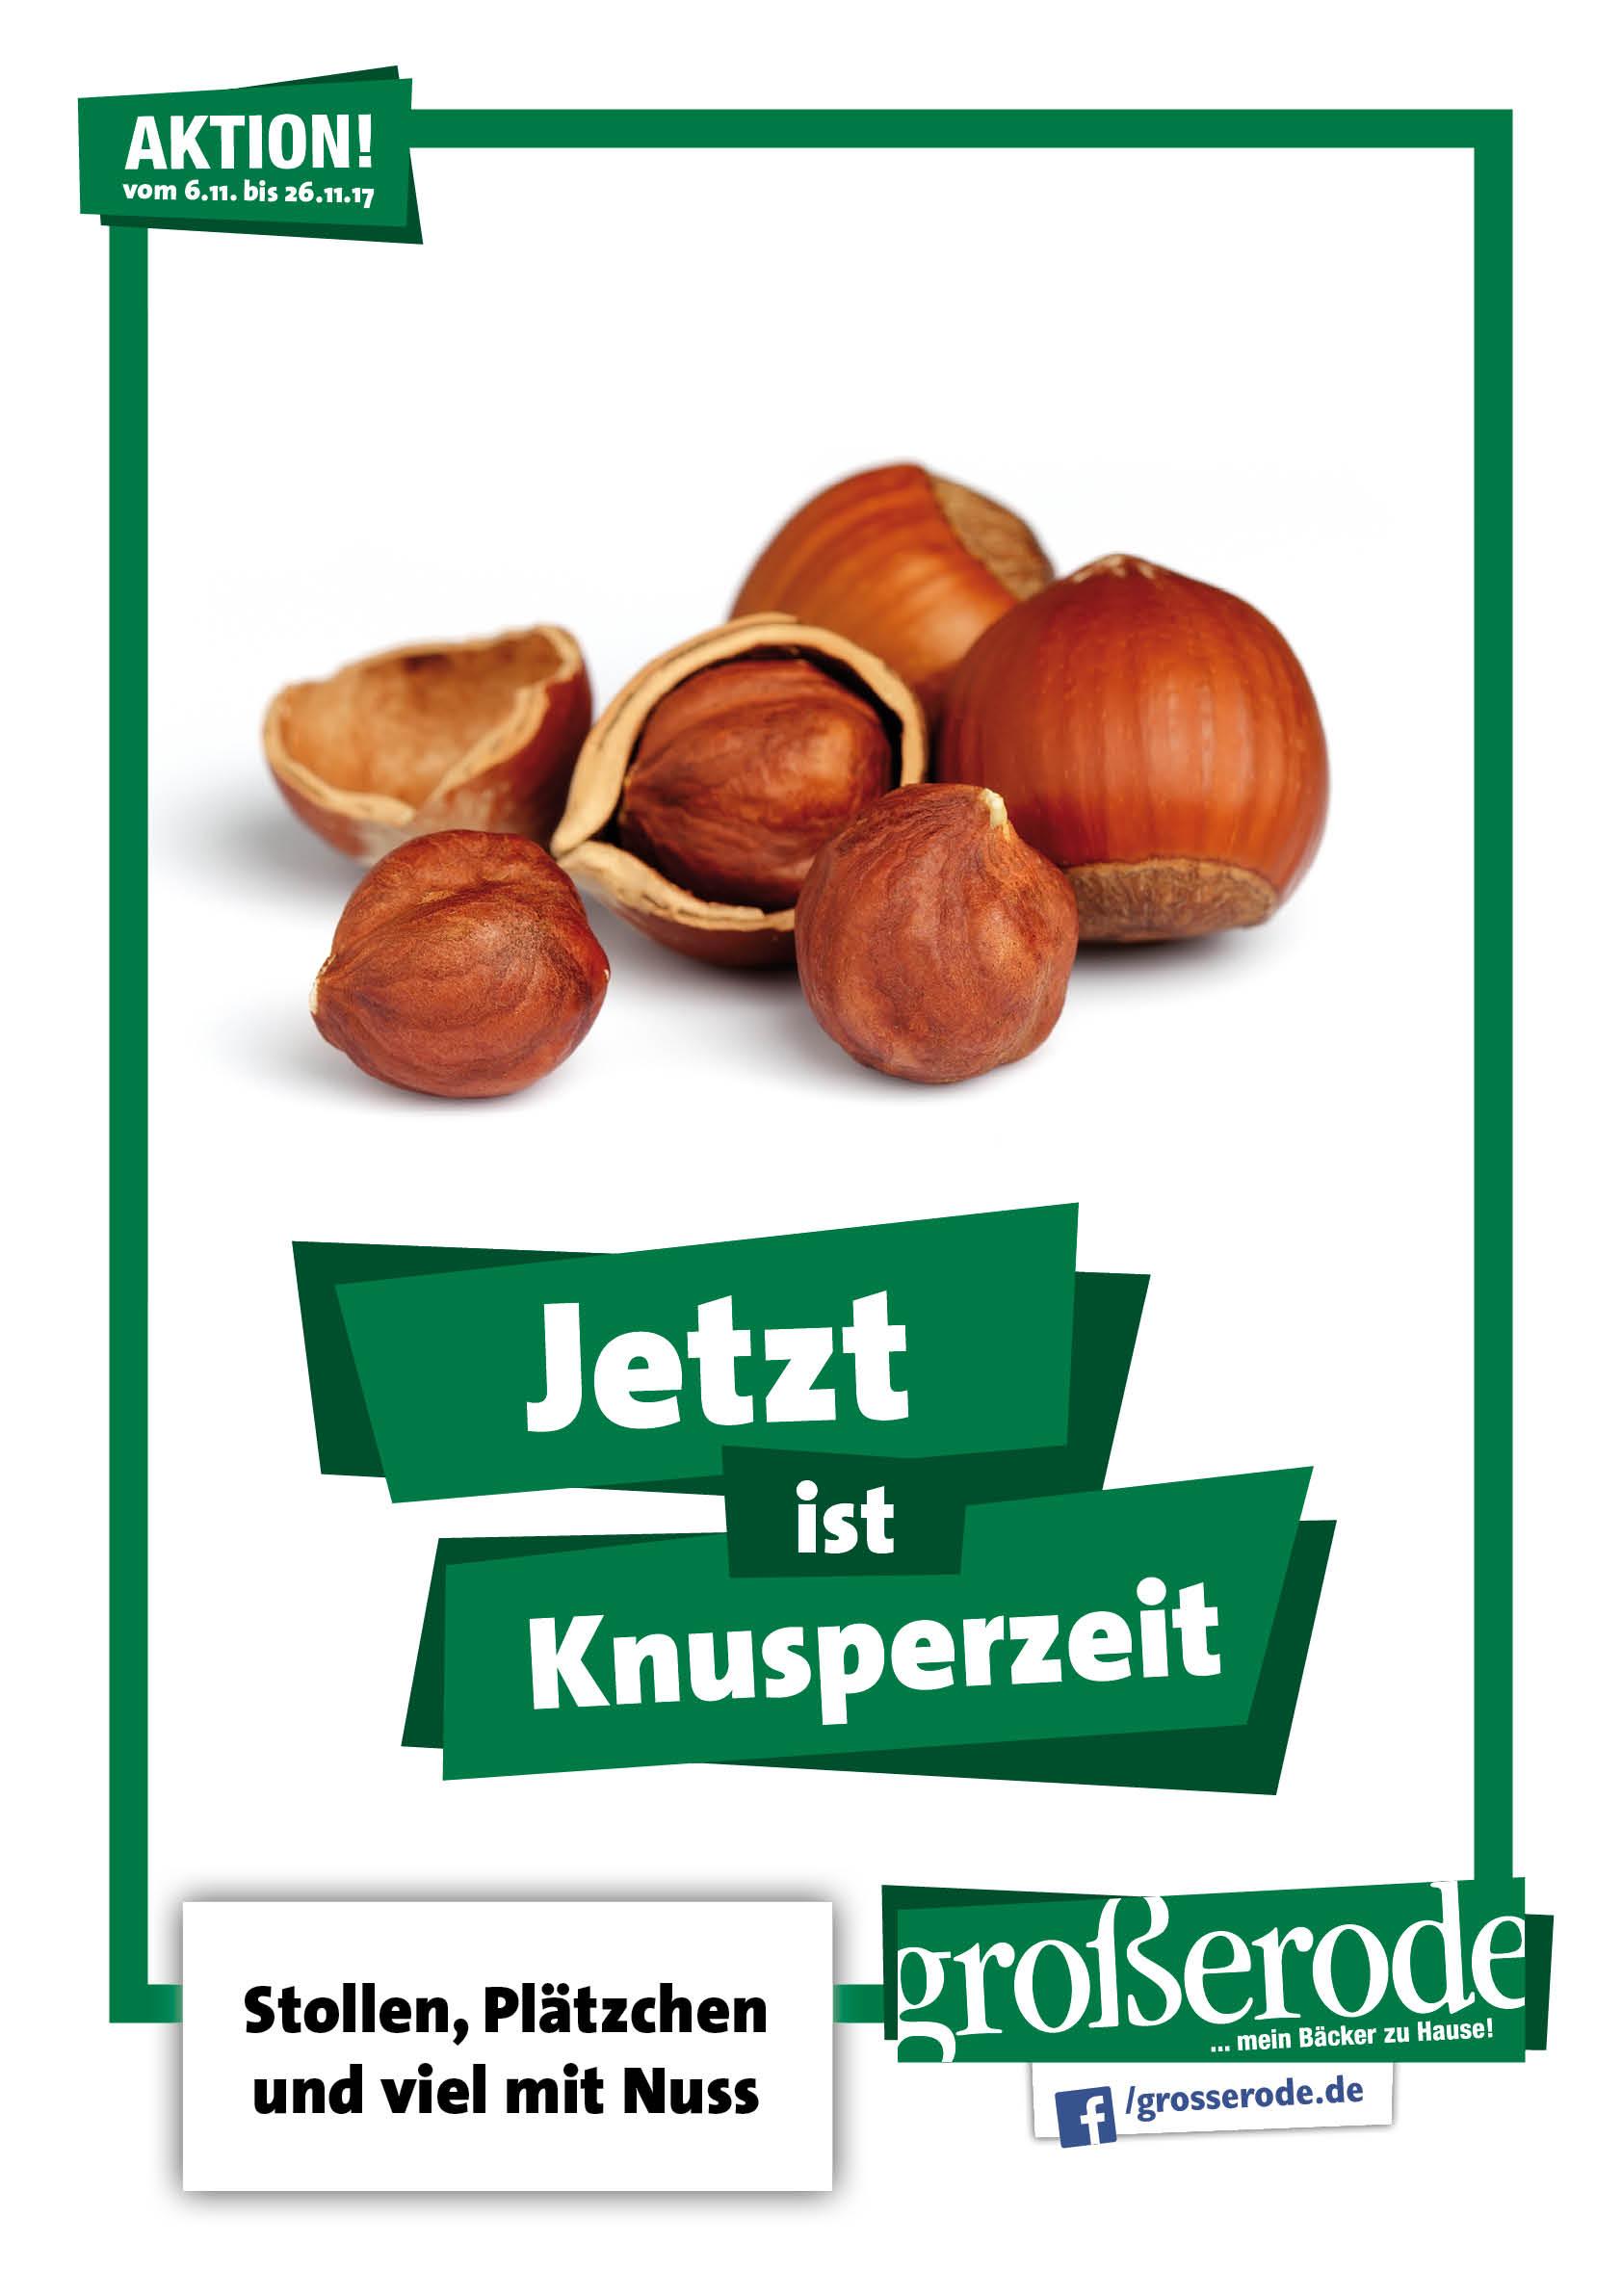 20171019_Grosserode_Knusperzeit_Plakat_Web_Nuss.jpg